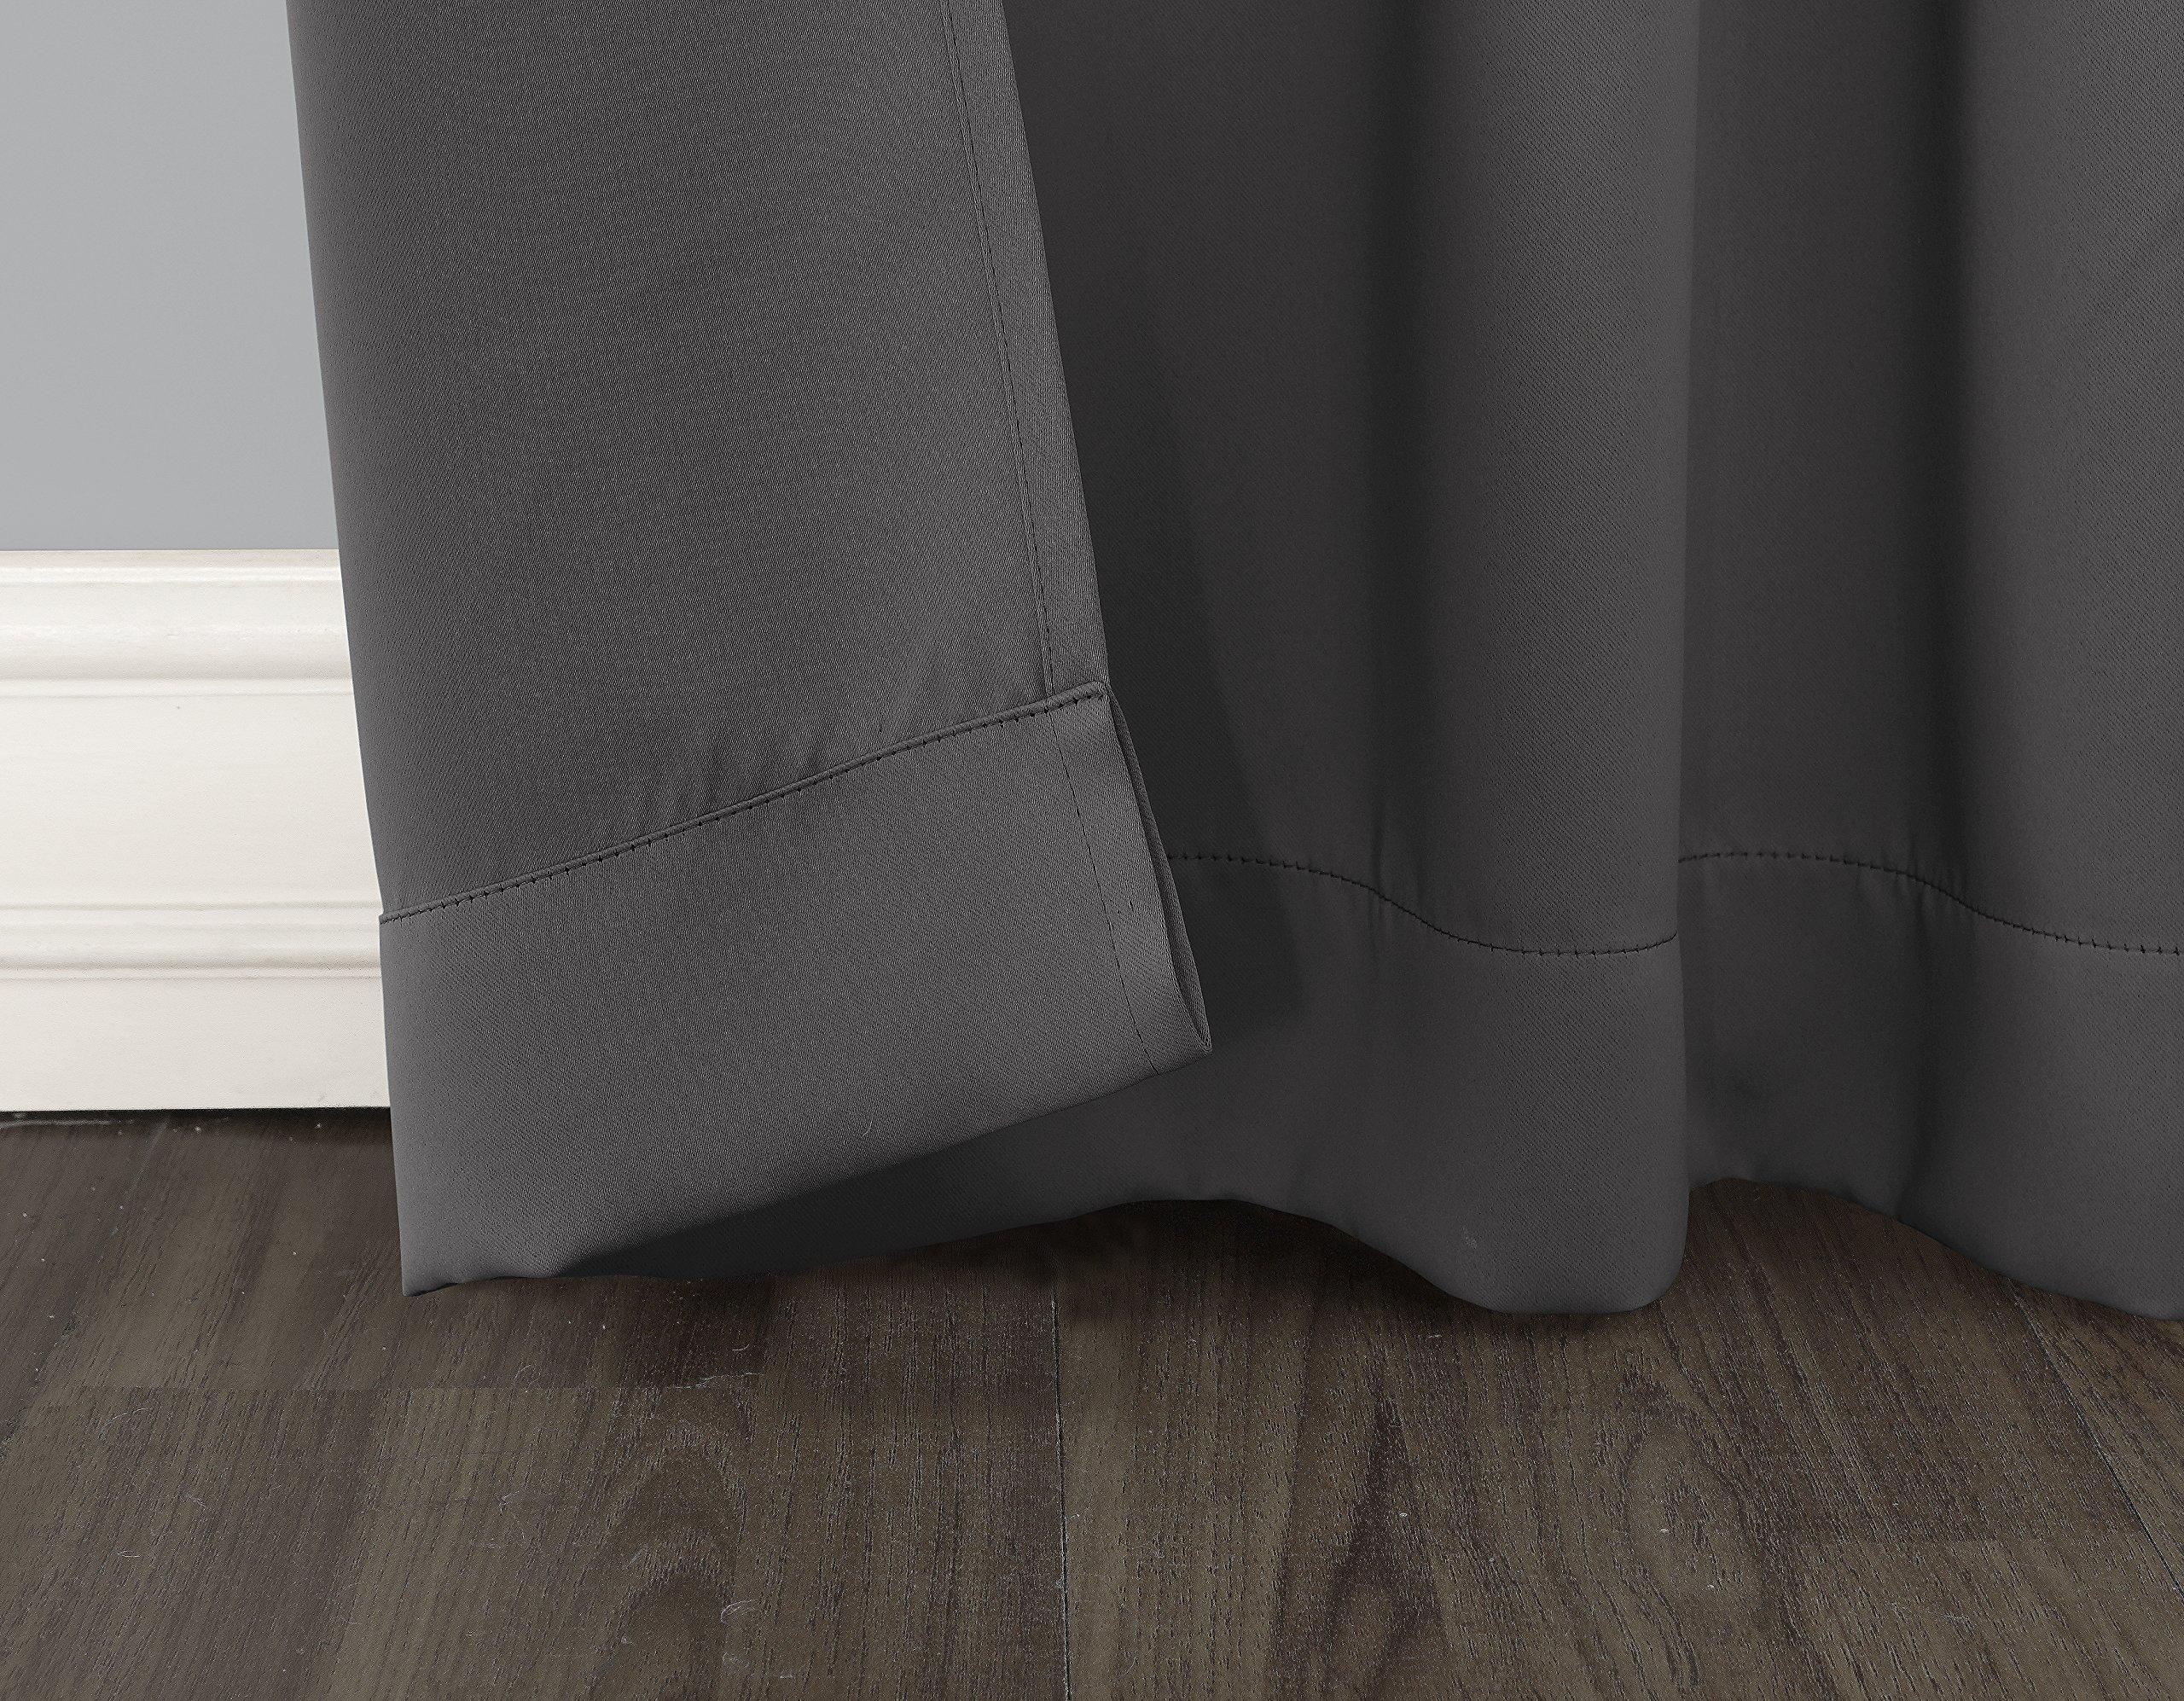 sun zero easton blackout patio door curtain panel 100 x 84 charcoal gray ebay. Black Bedroom Furniture Sets. Home Design Ideas